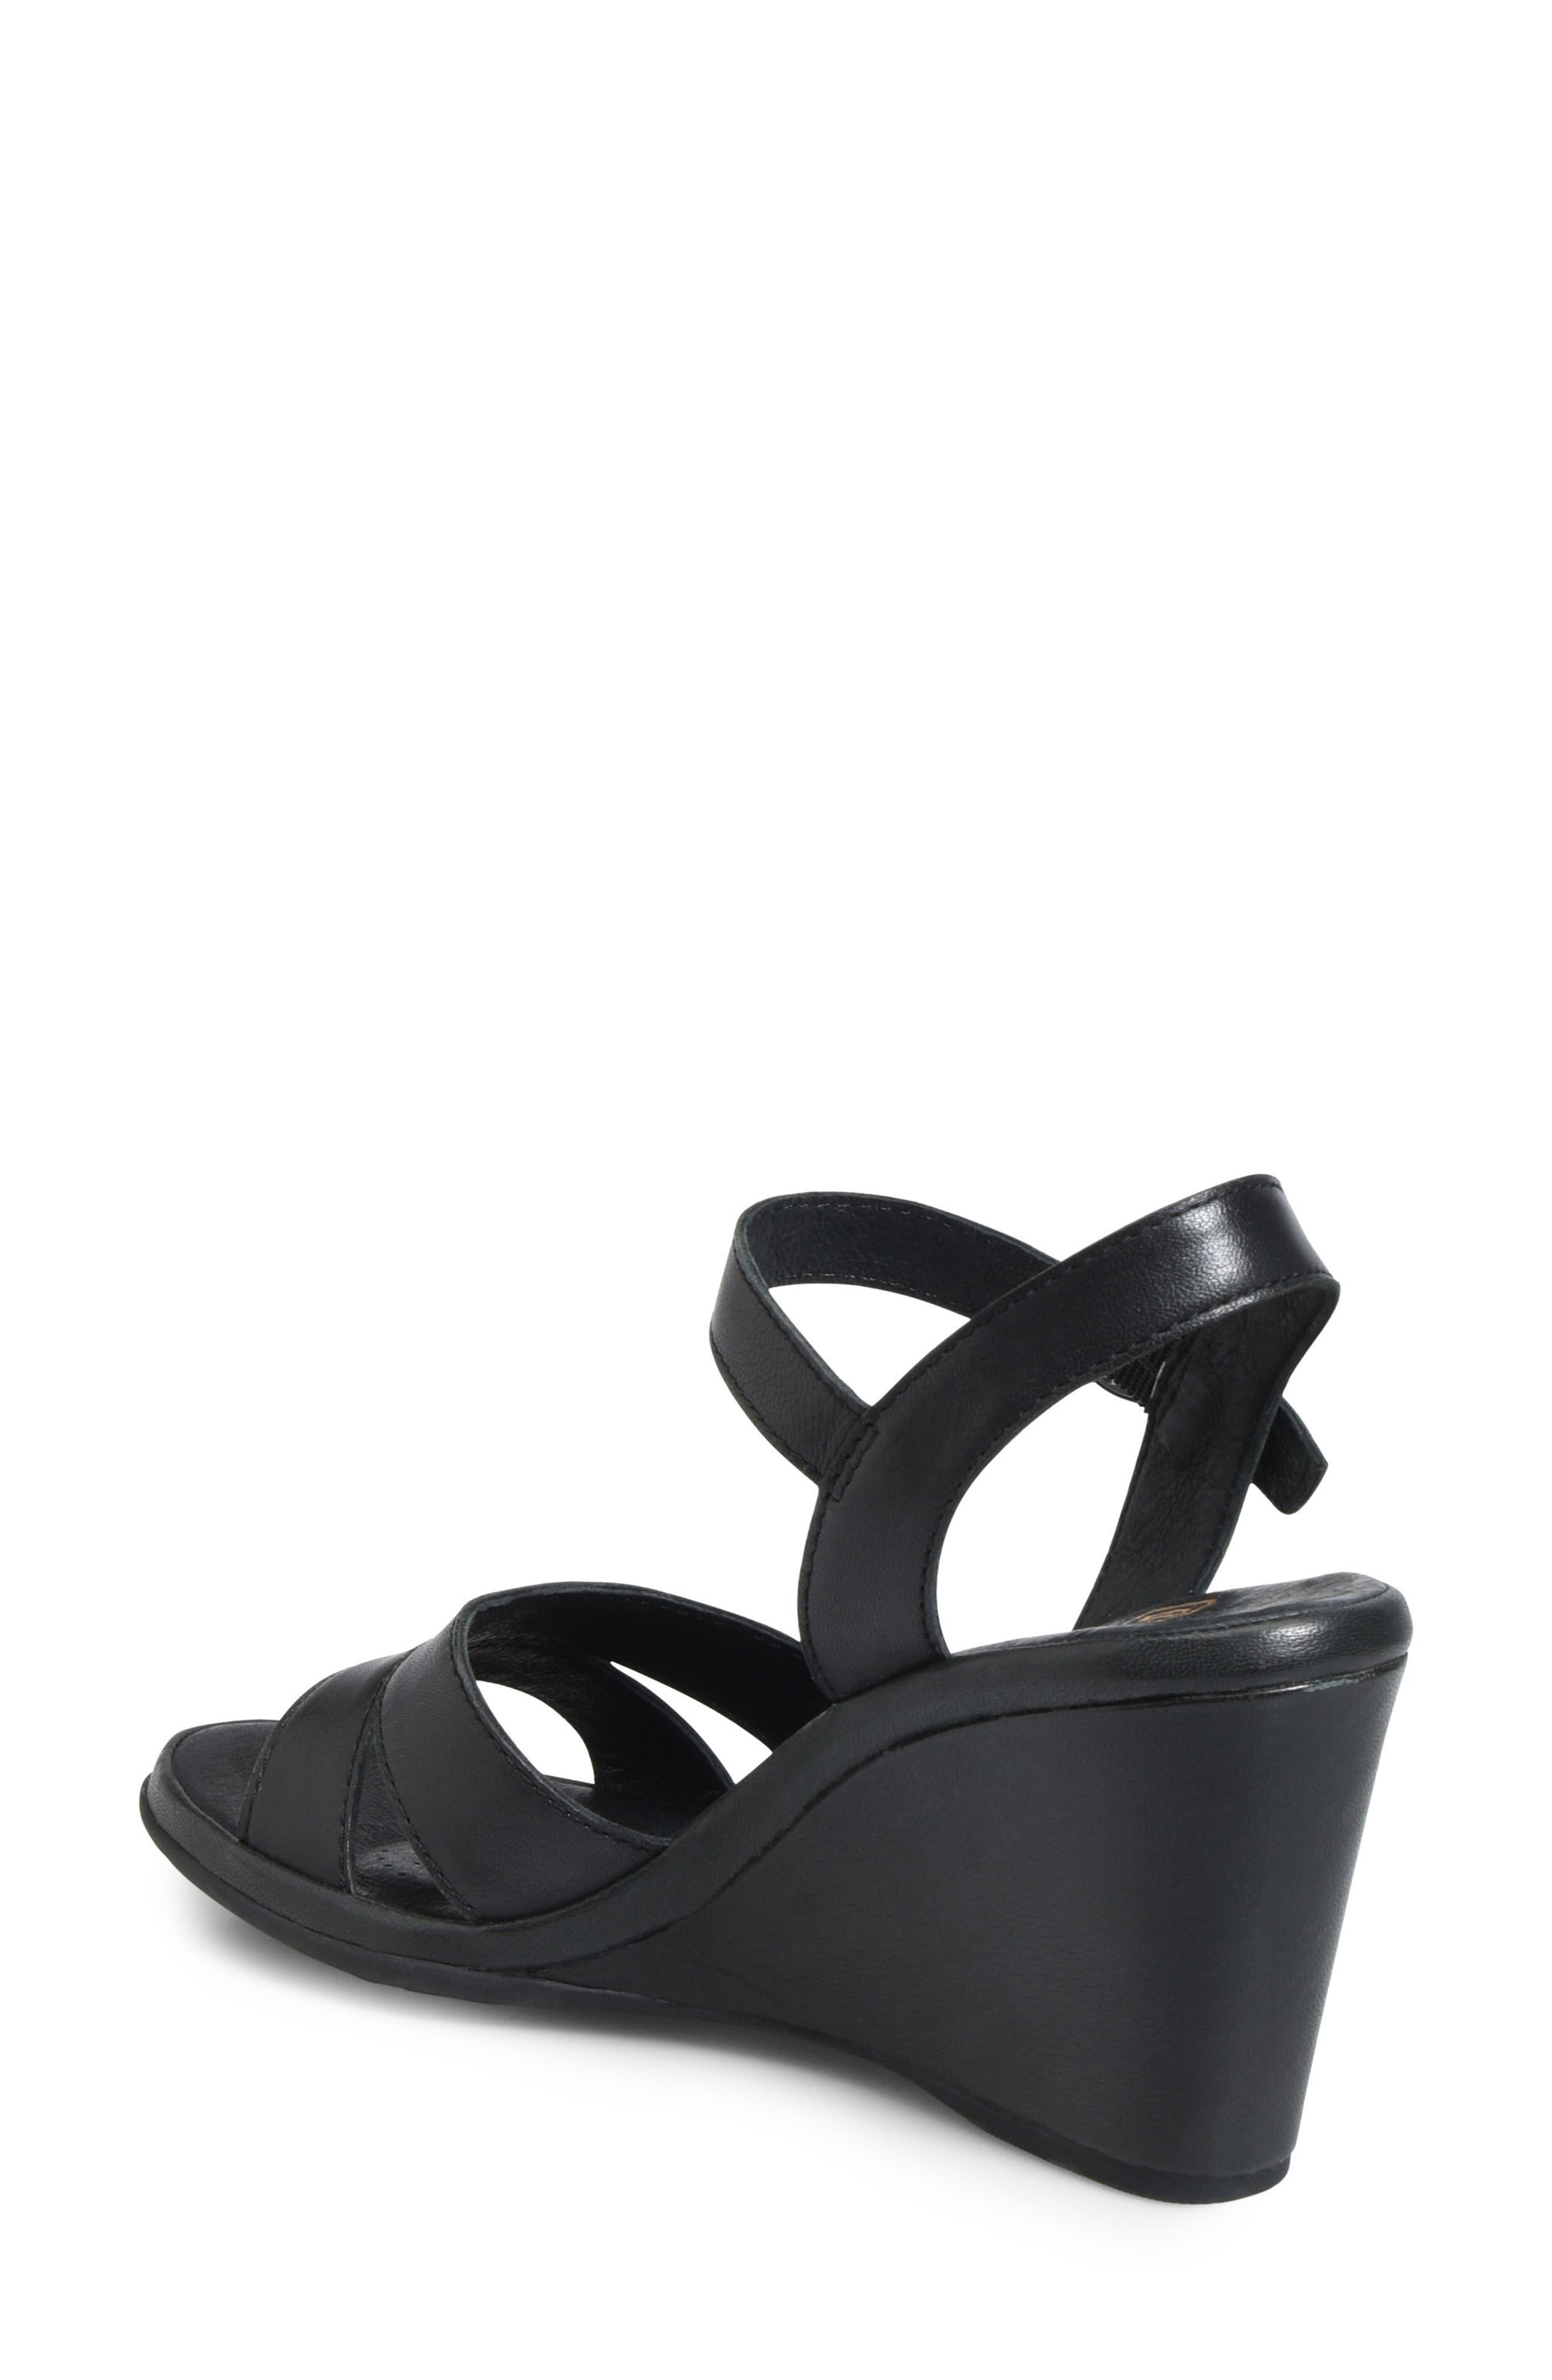 Hydro Wedge Sandal,                             Alternate thumbnail 2, color,                             Black Leather